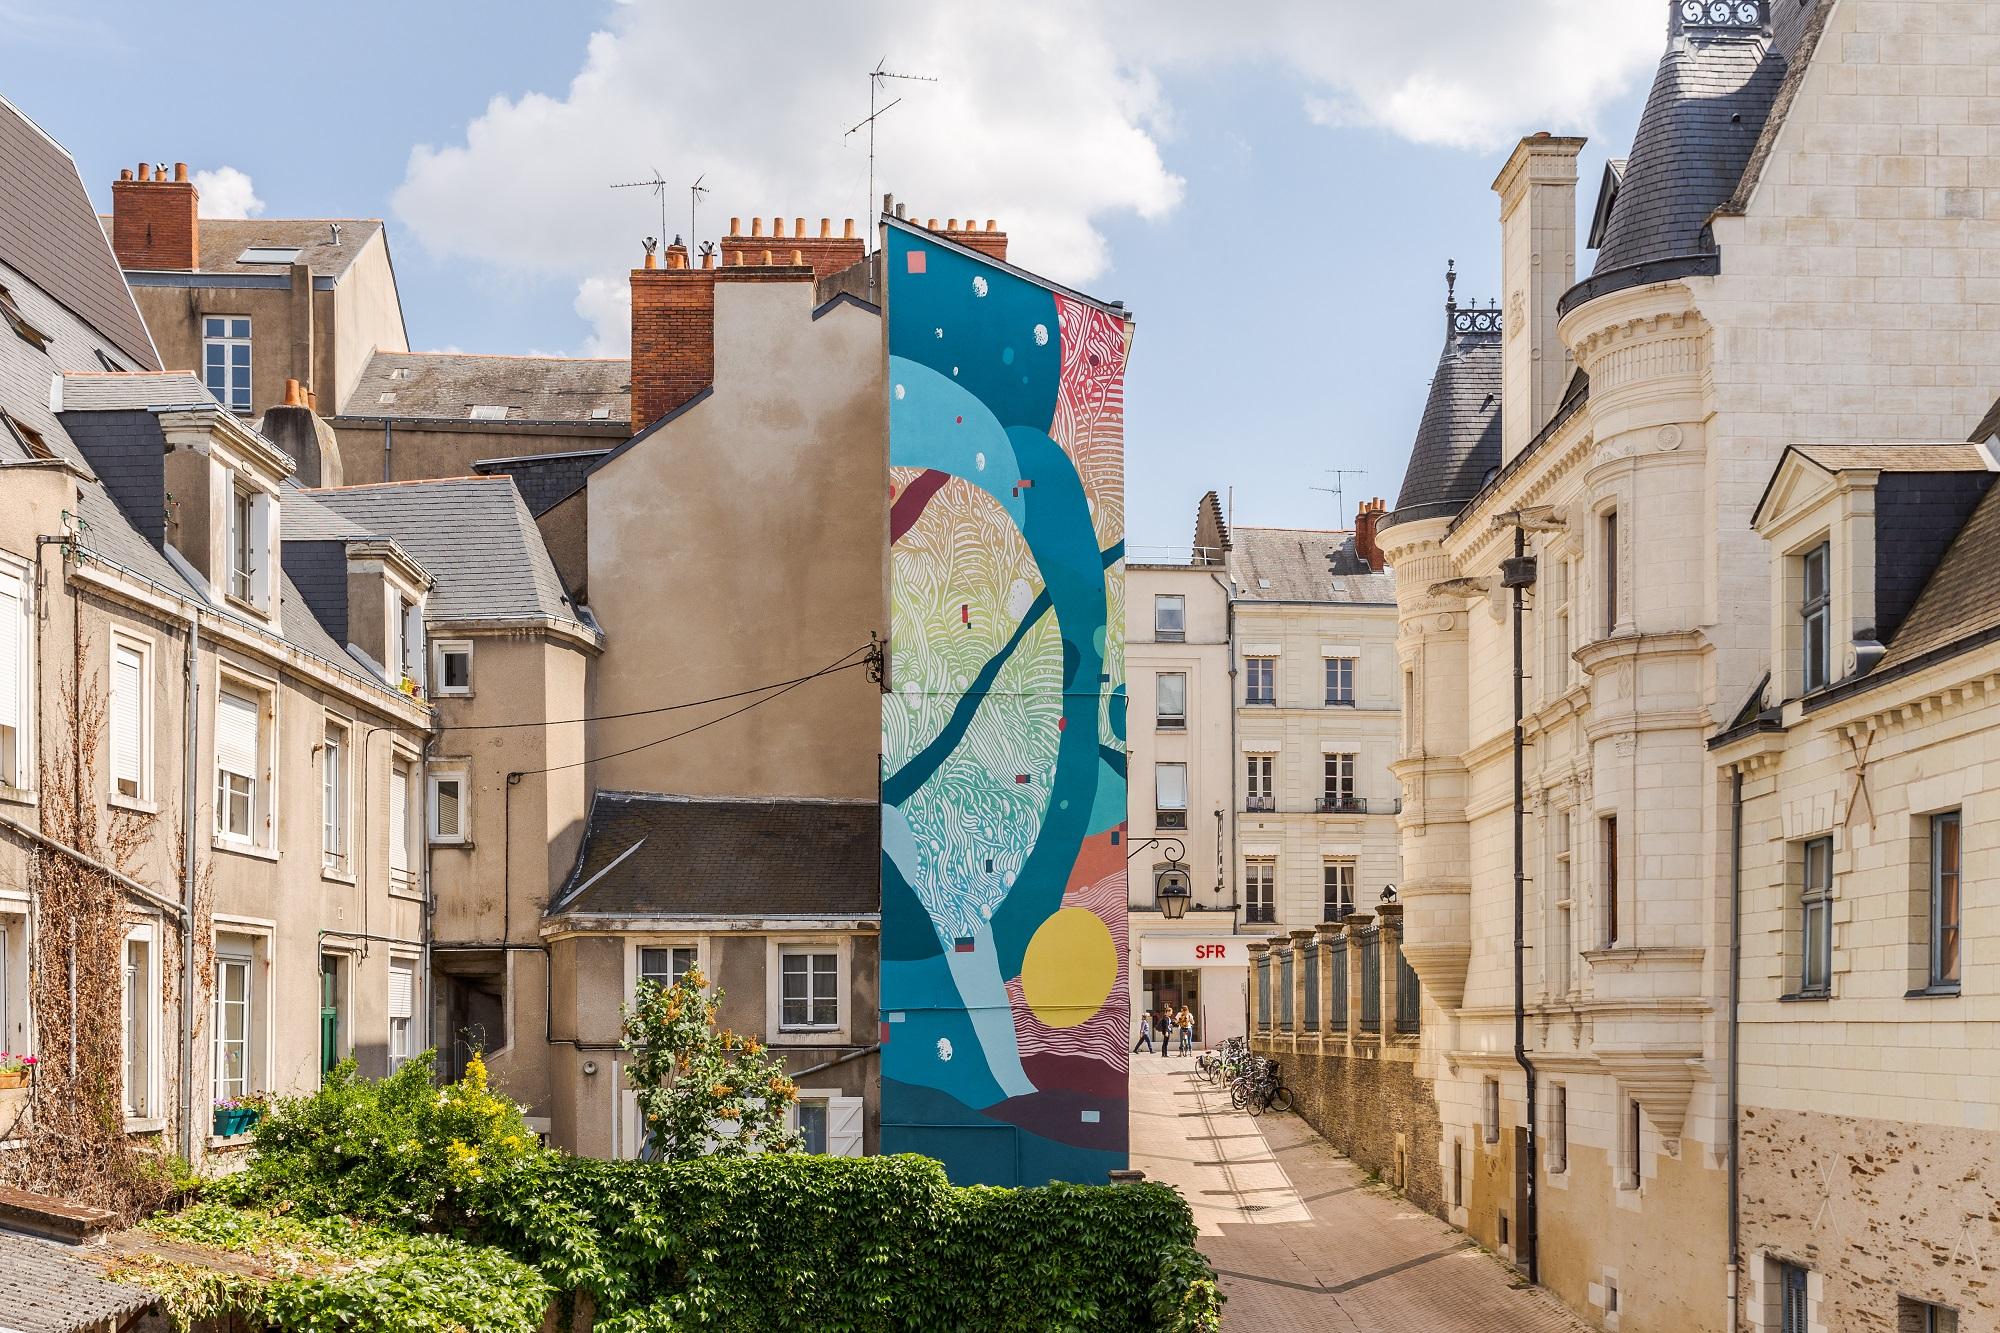 Tellas Angers Echappées d'Art 2018 street art